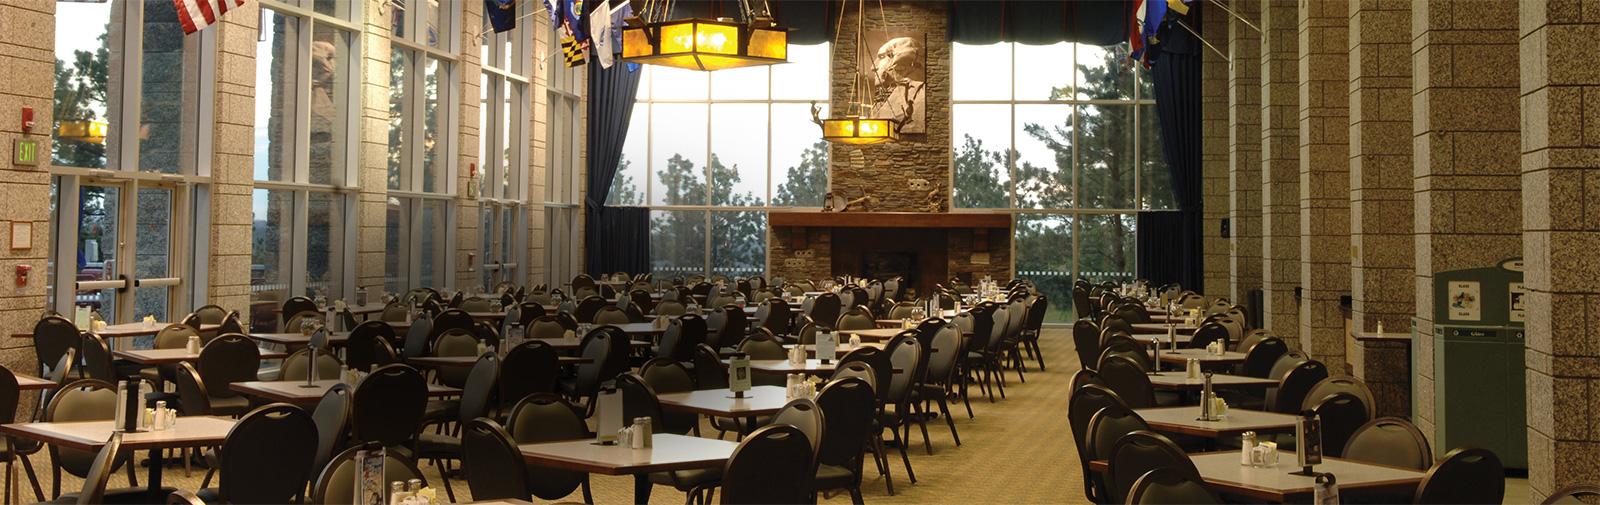 Carver S Cafe Mount Rushmore National Memorial